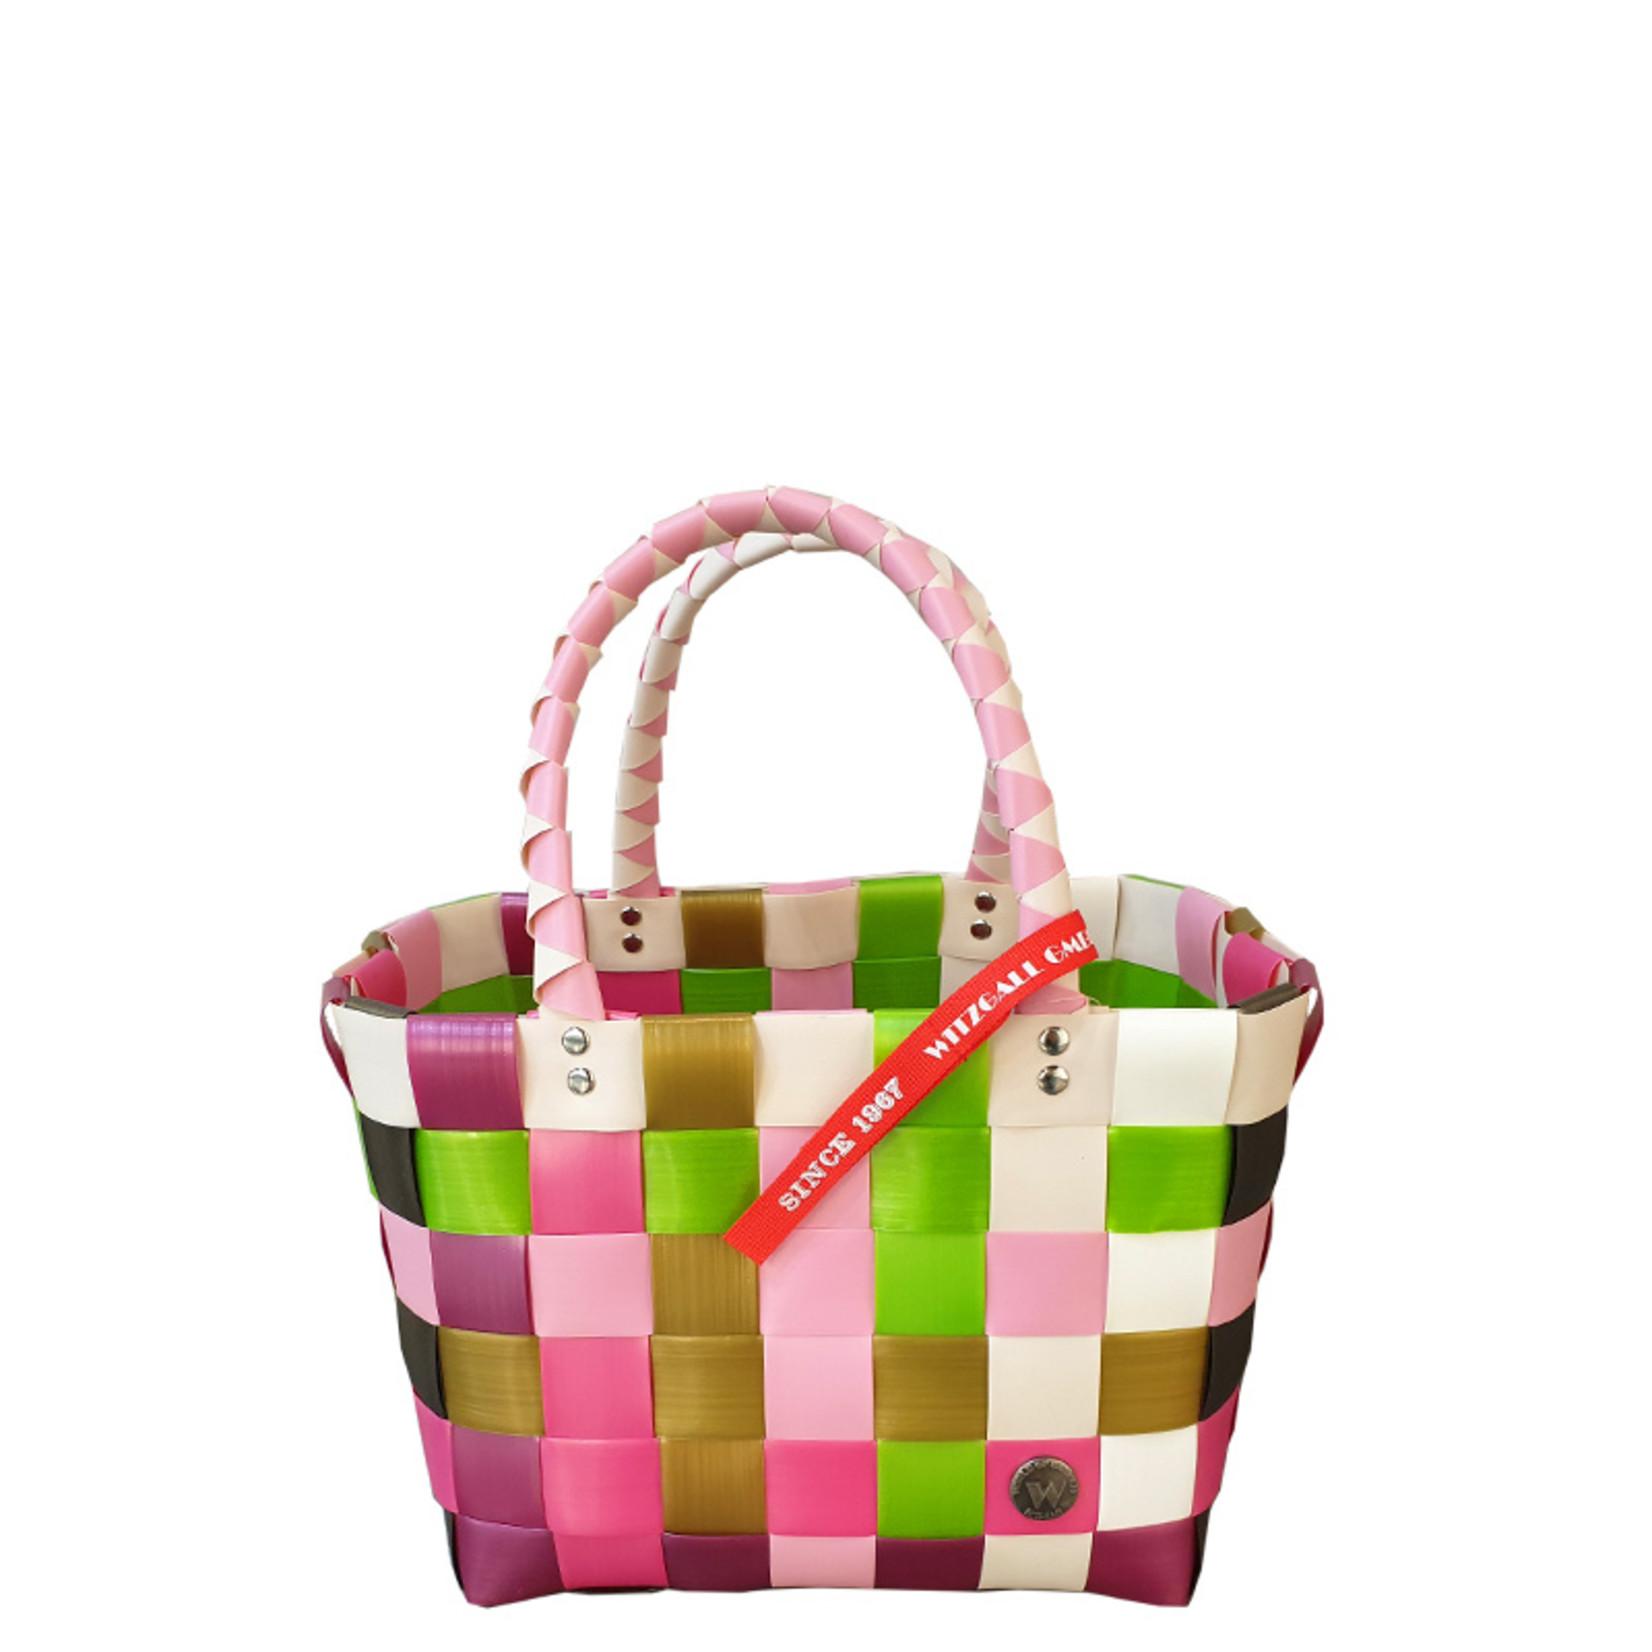 ICE BAG Taschen ICE BAG Mini Shopper 5008-39   Original Witzgall Tasche   rosa -pink-grün